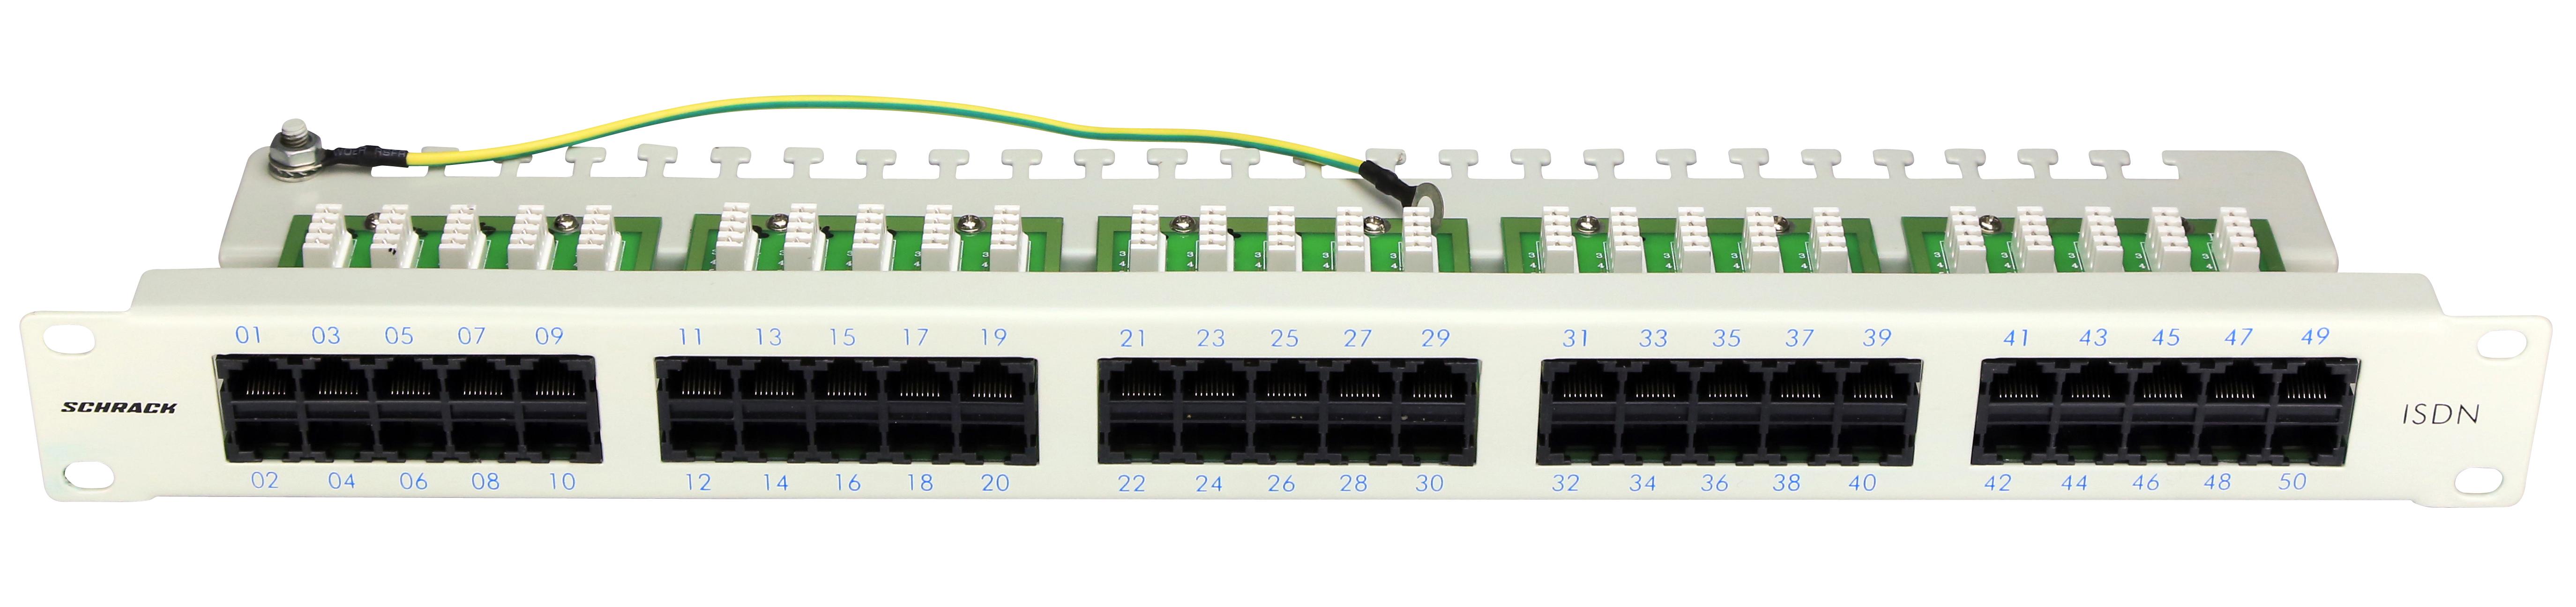 1 Stk Patchpanel 50xRJ45 ungeschirmt, ISDN, 19, 1HE, RAL7035 HSERU50IGC